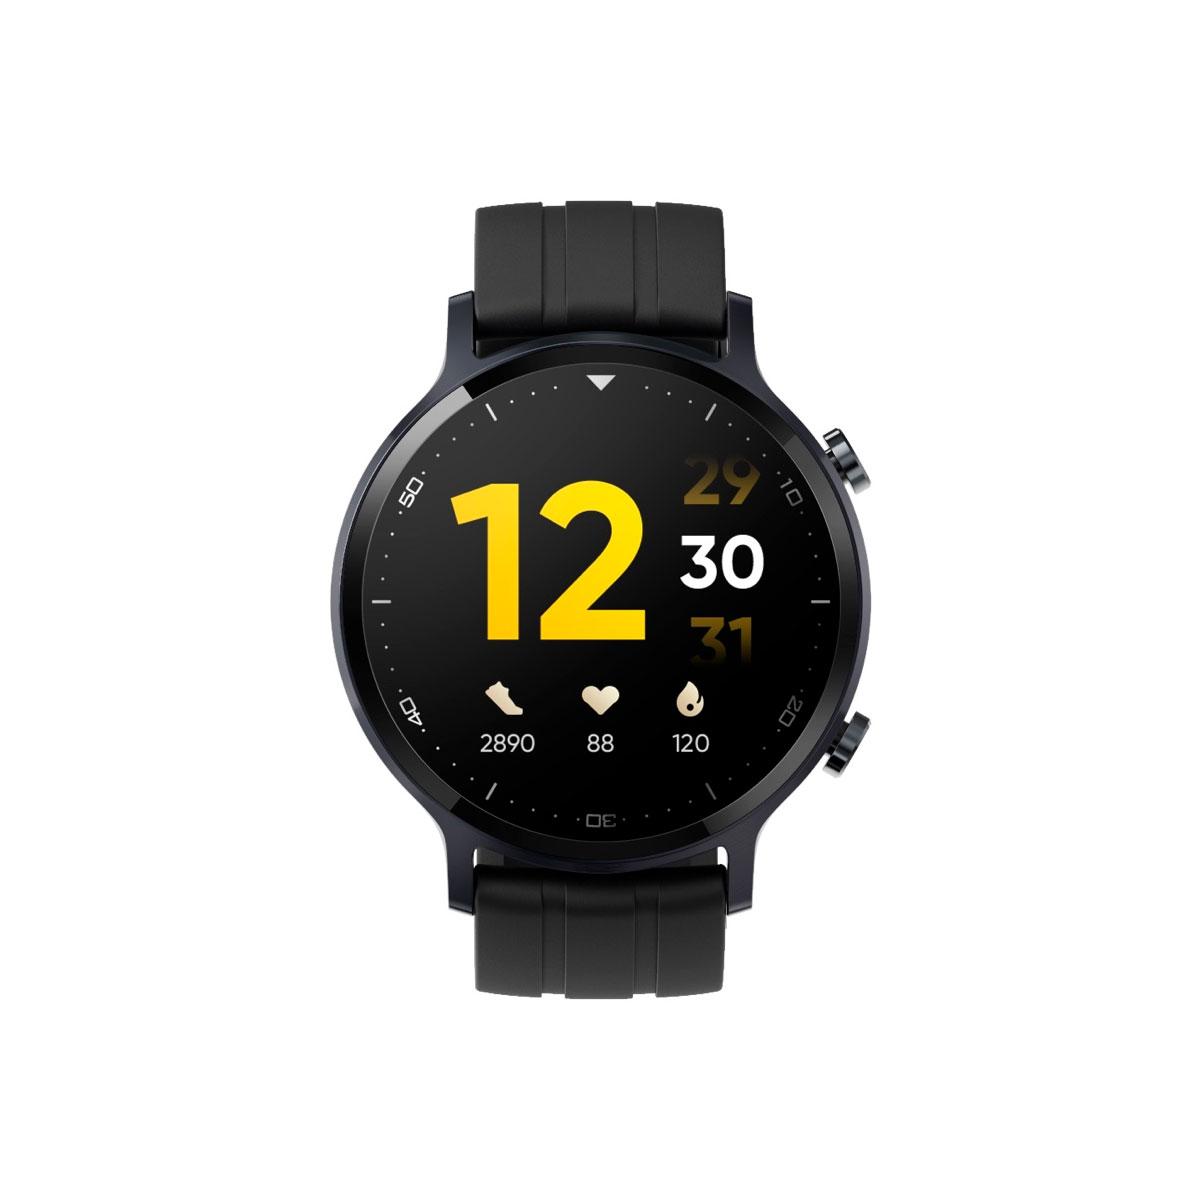 Smartwatch realme Watch S Relógio Inteligente com Monitor Cardíaco